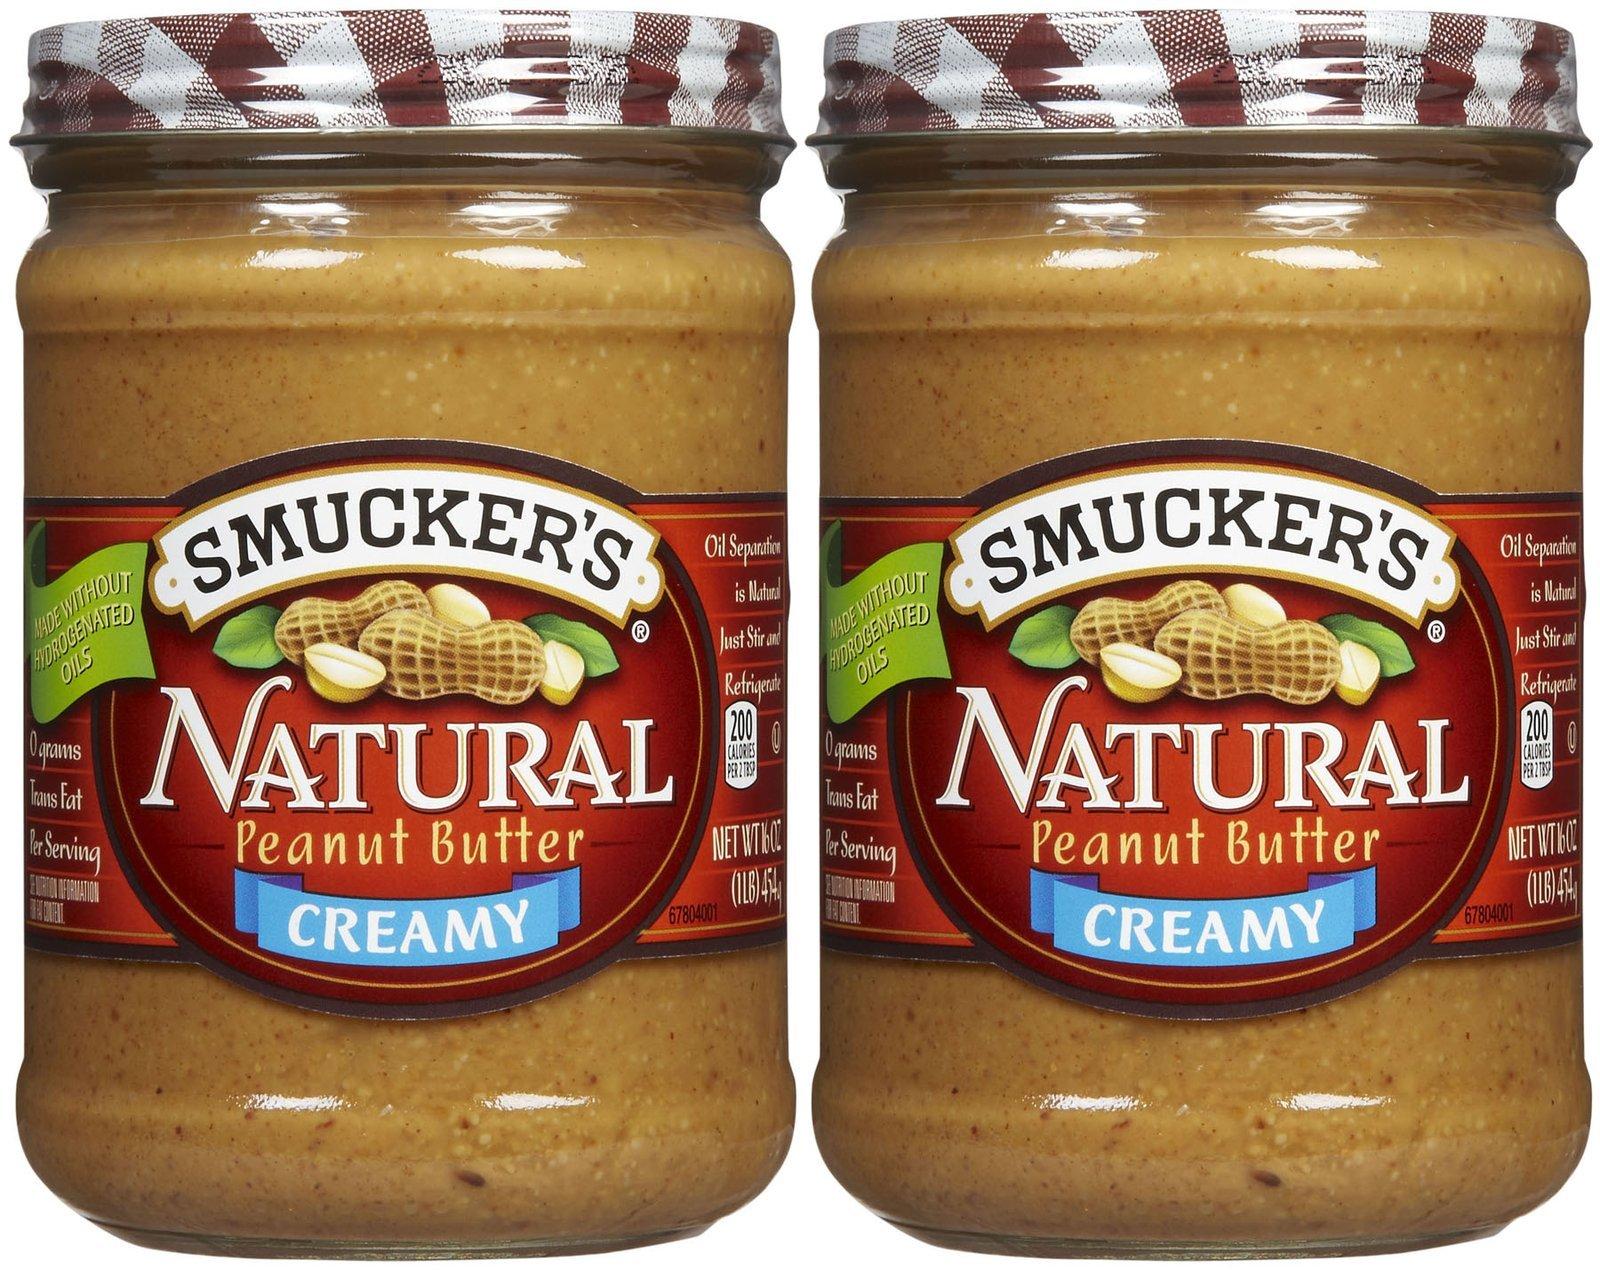 Smucker's Creamy Natural Peanut Butter - 16 oz - 2 pk